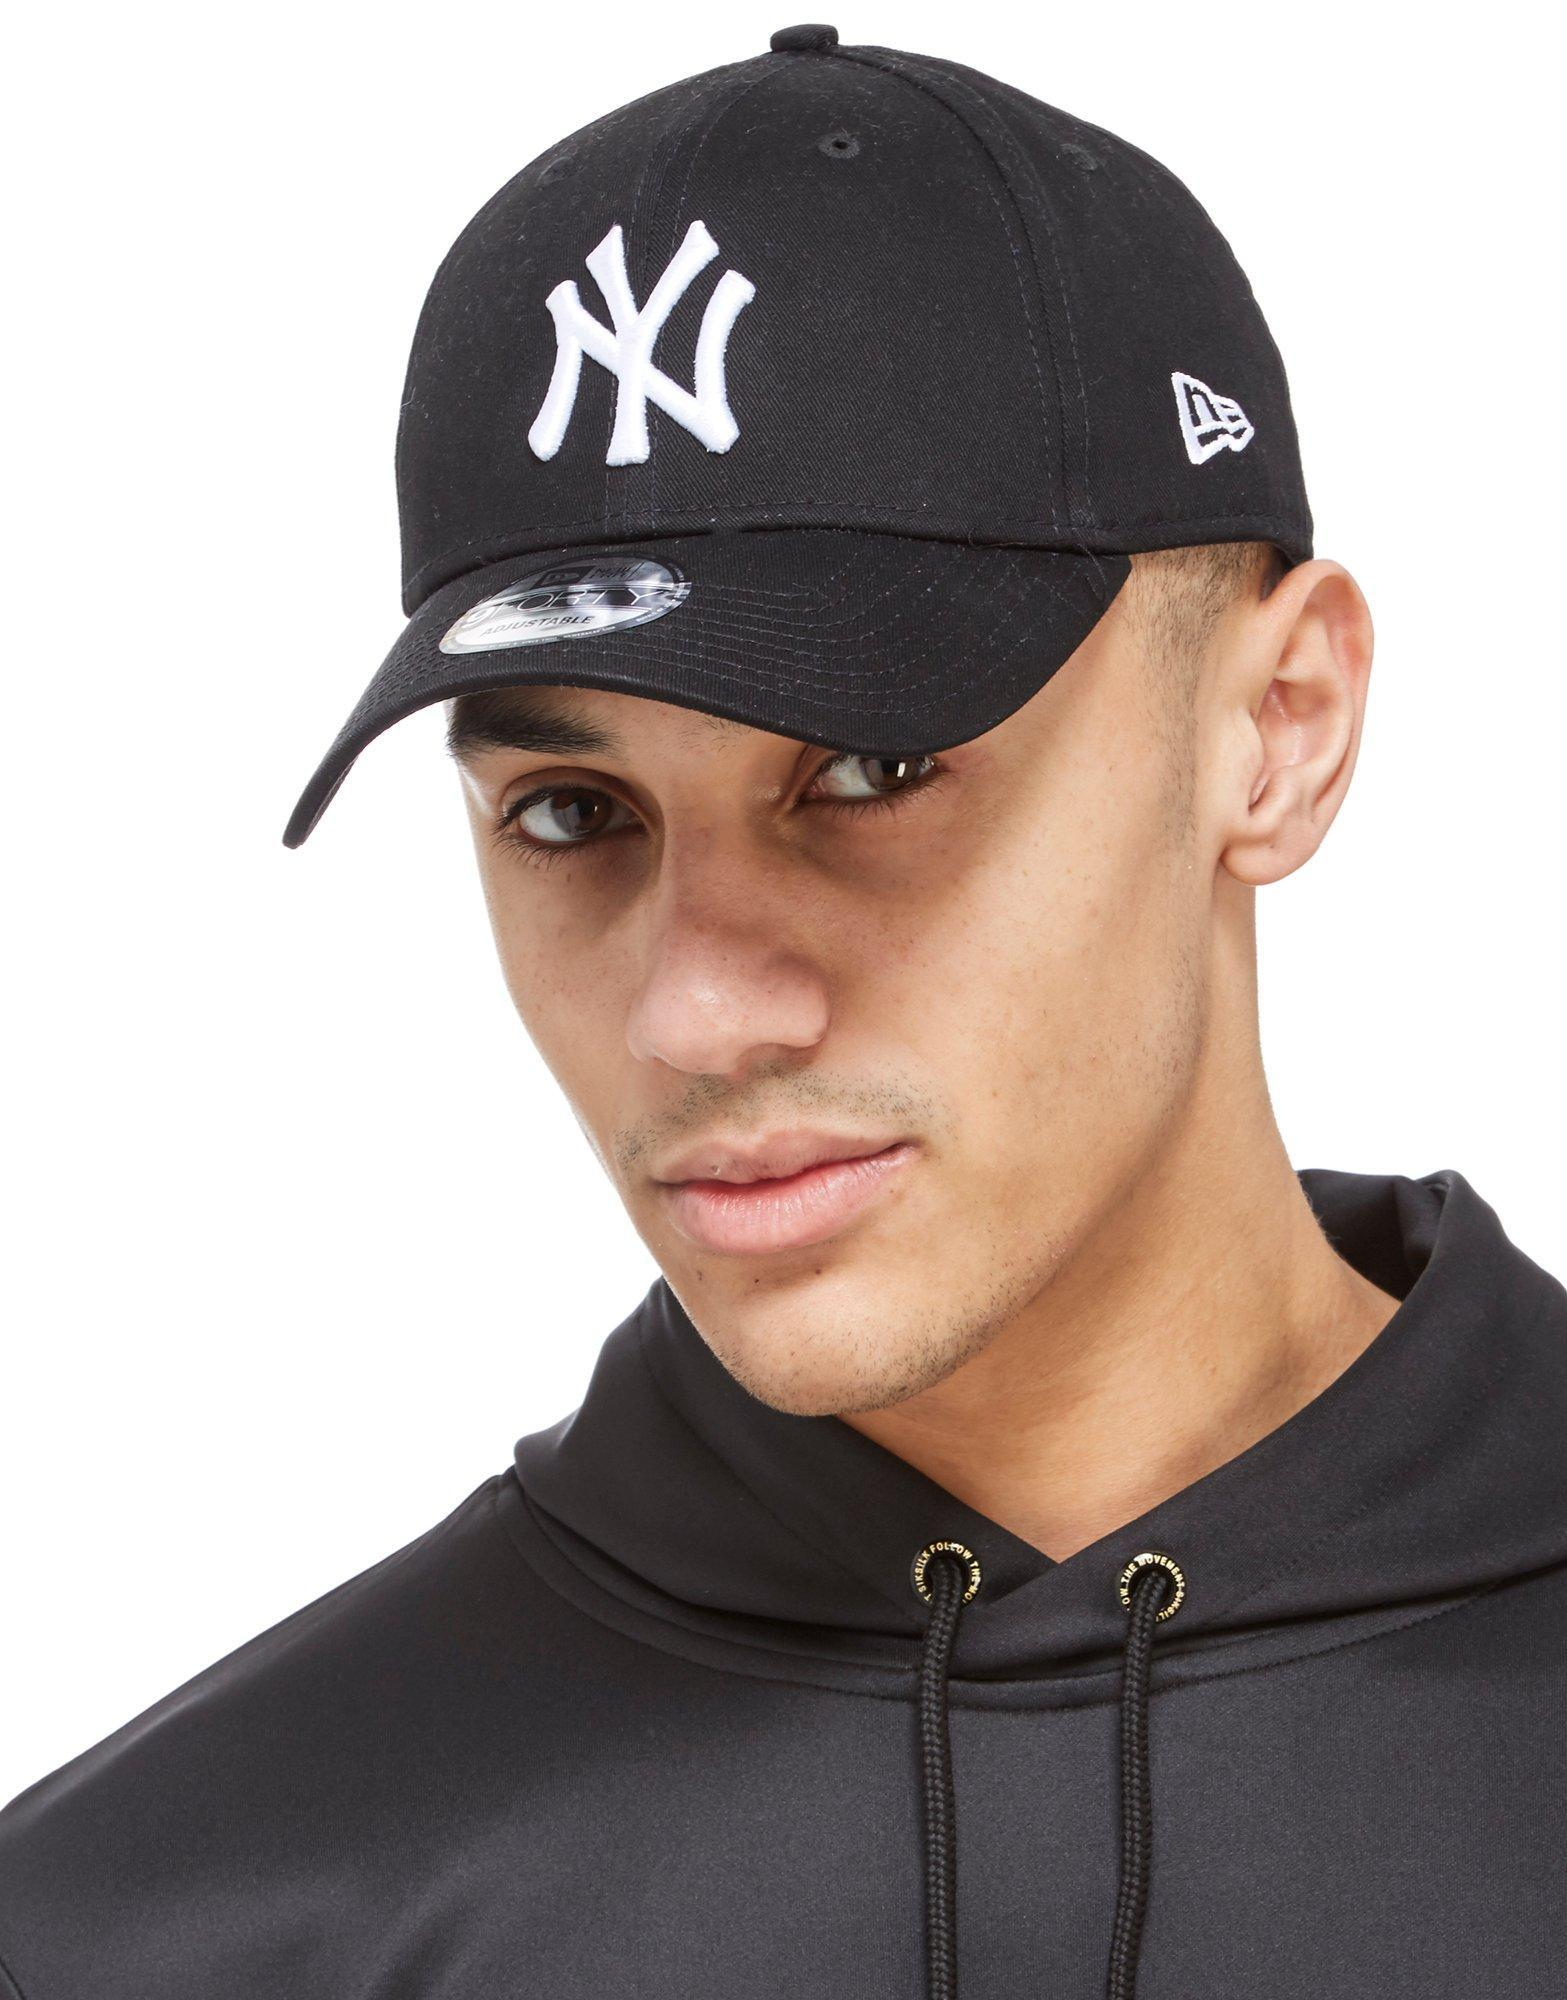 Lyst - KTZ Mlb New York Yankees 9forty Cap in Black 788c0a01313